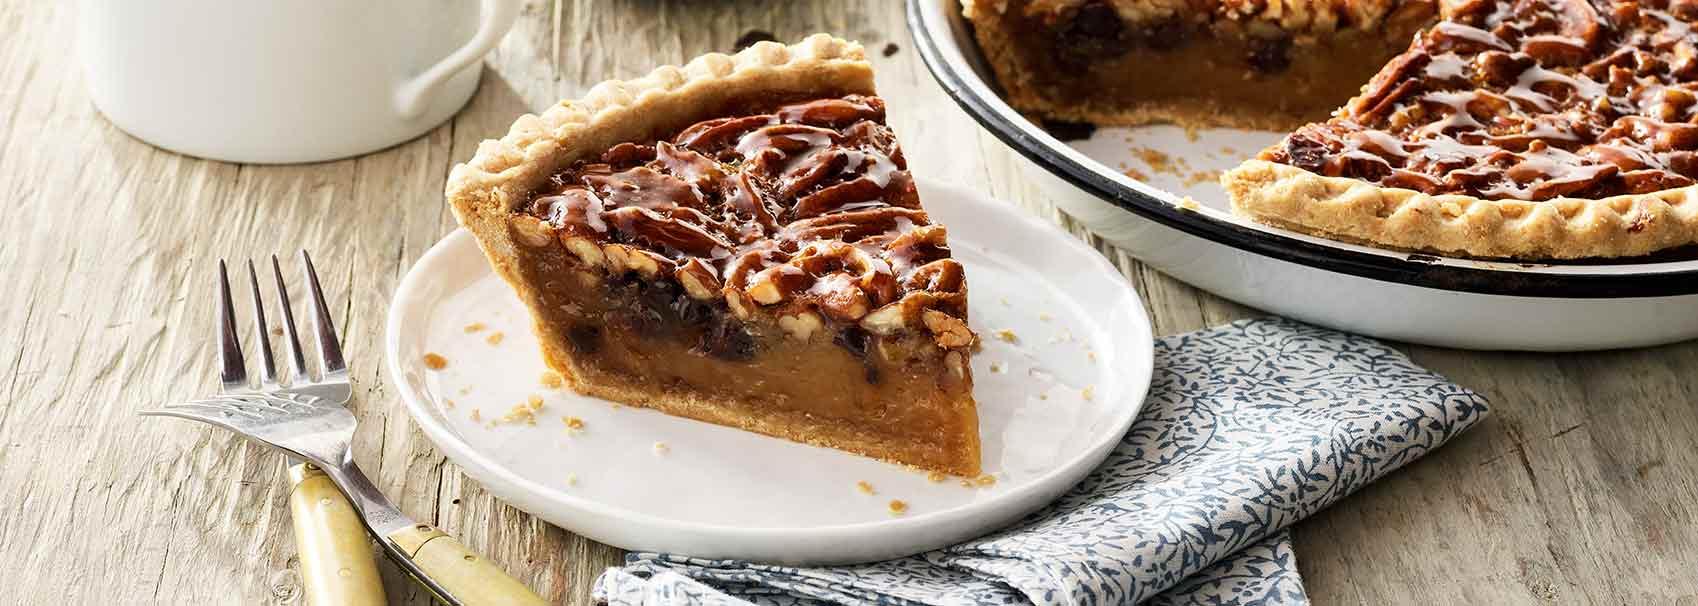 Save 20% on Chocolate Pecan Pies!